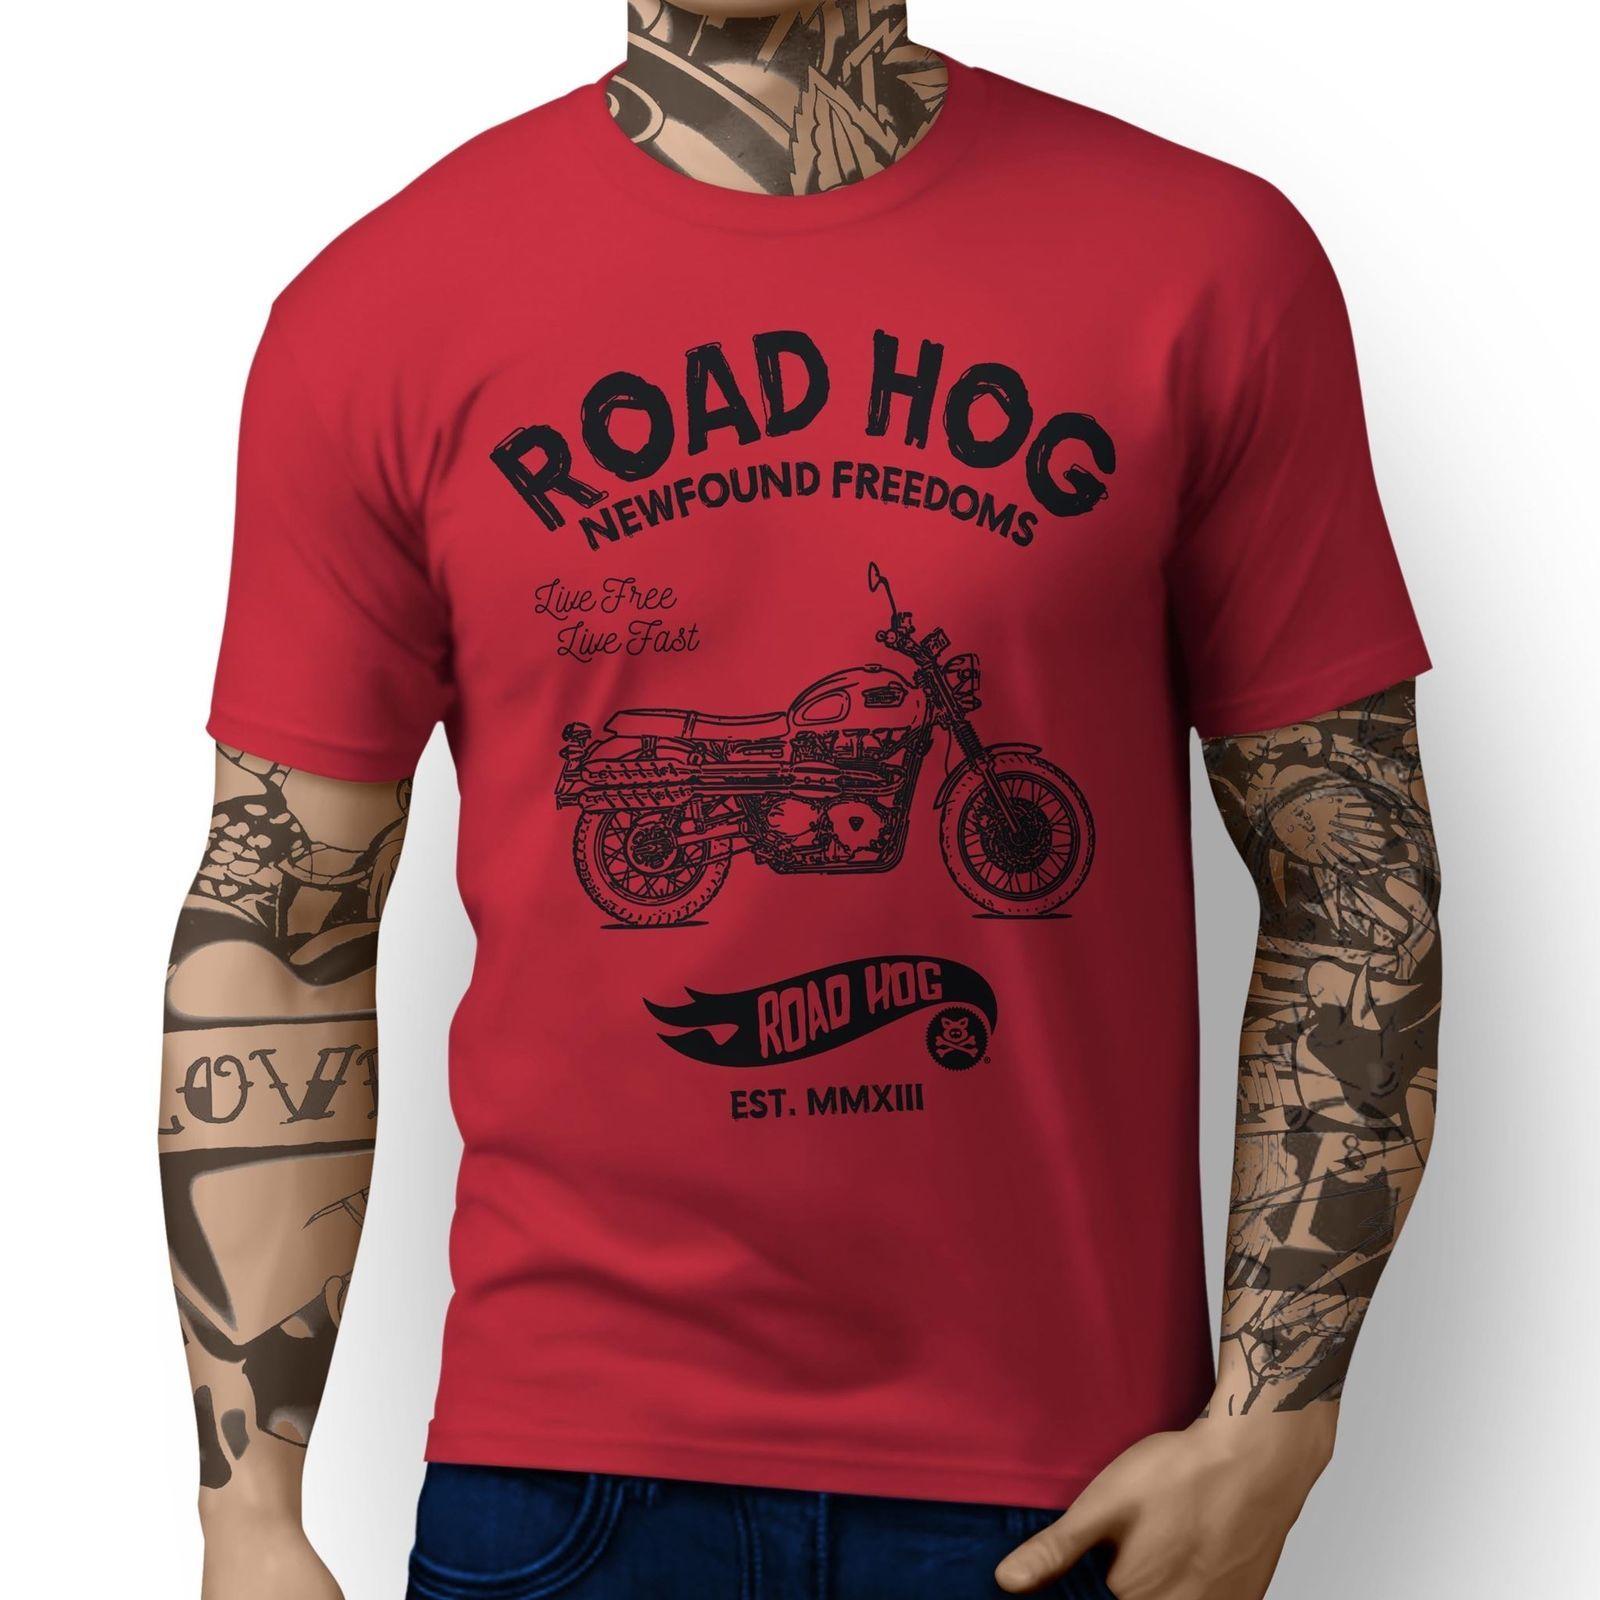 34eabc114 Rh Freedom Triumph Cheap Hot Sale 2016 Inspired Motorbike Art T Shirts T  Shirt Men Funny Tee Shirts Short Sleeve Make Tee Shirts T Shirts Print From  ...